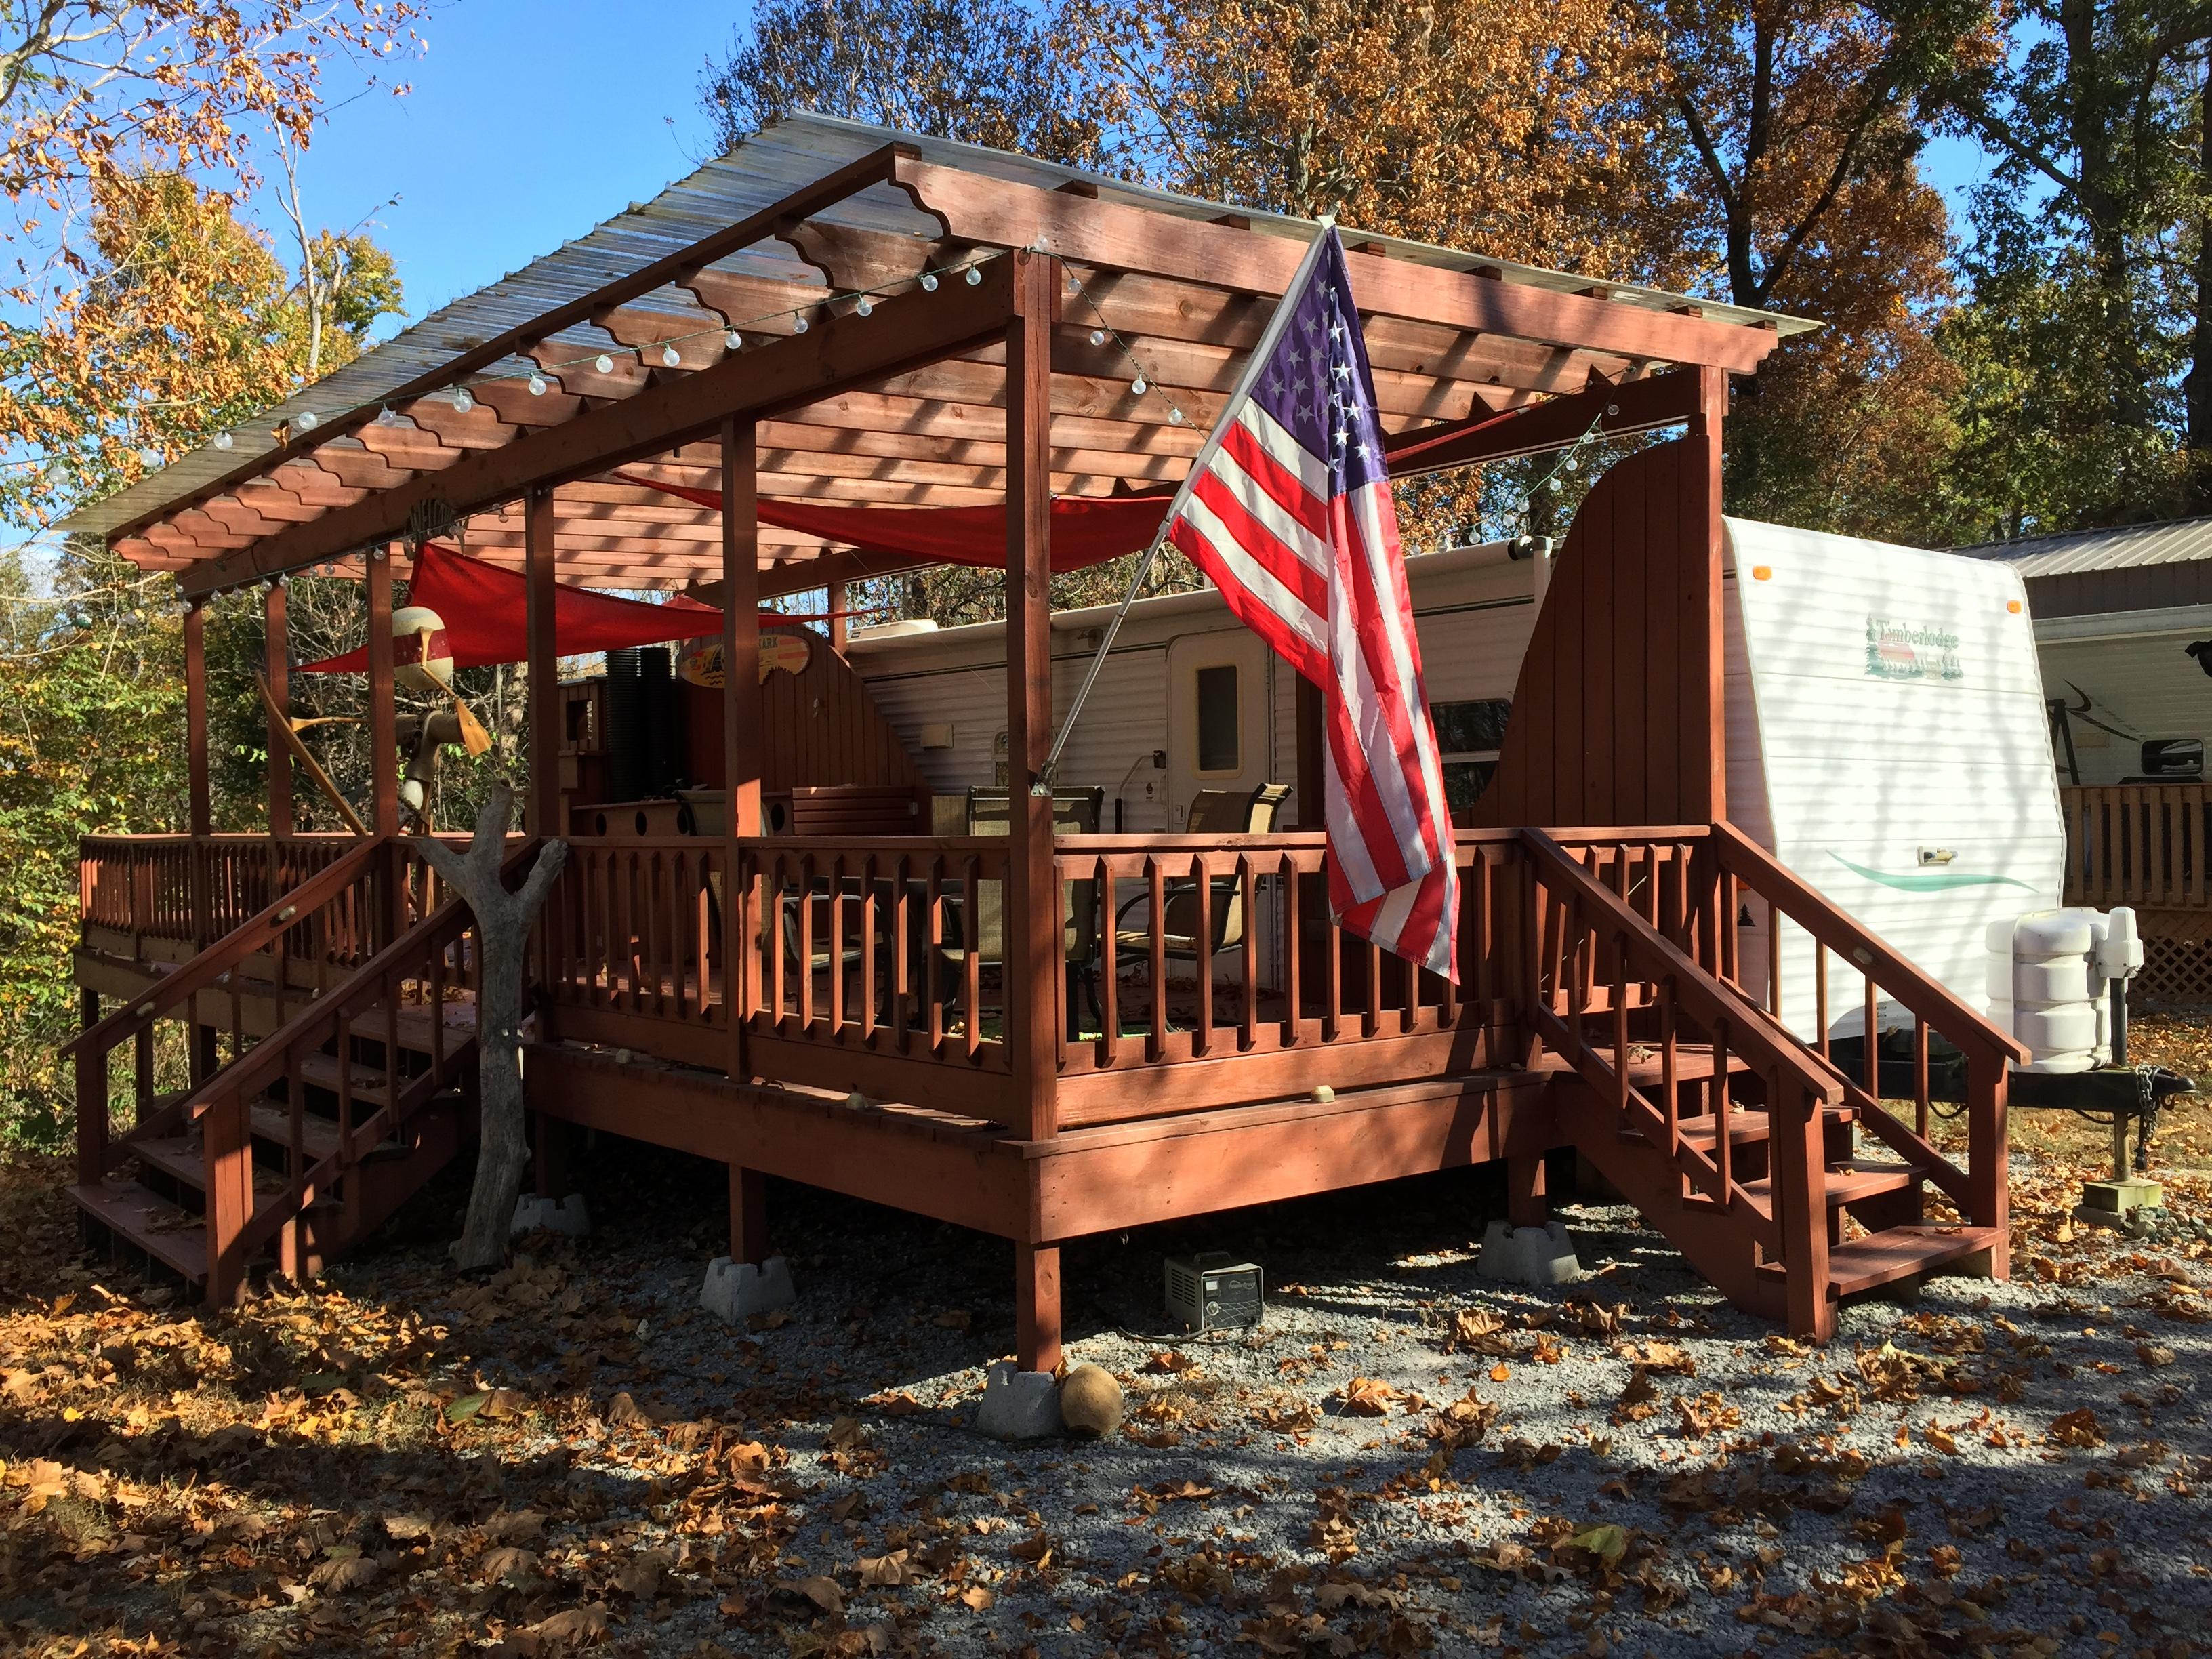 Holiday Hills Resort on Lake Barkley